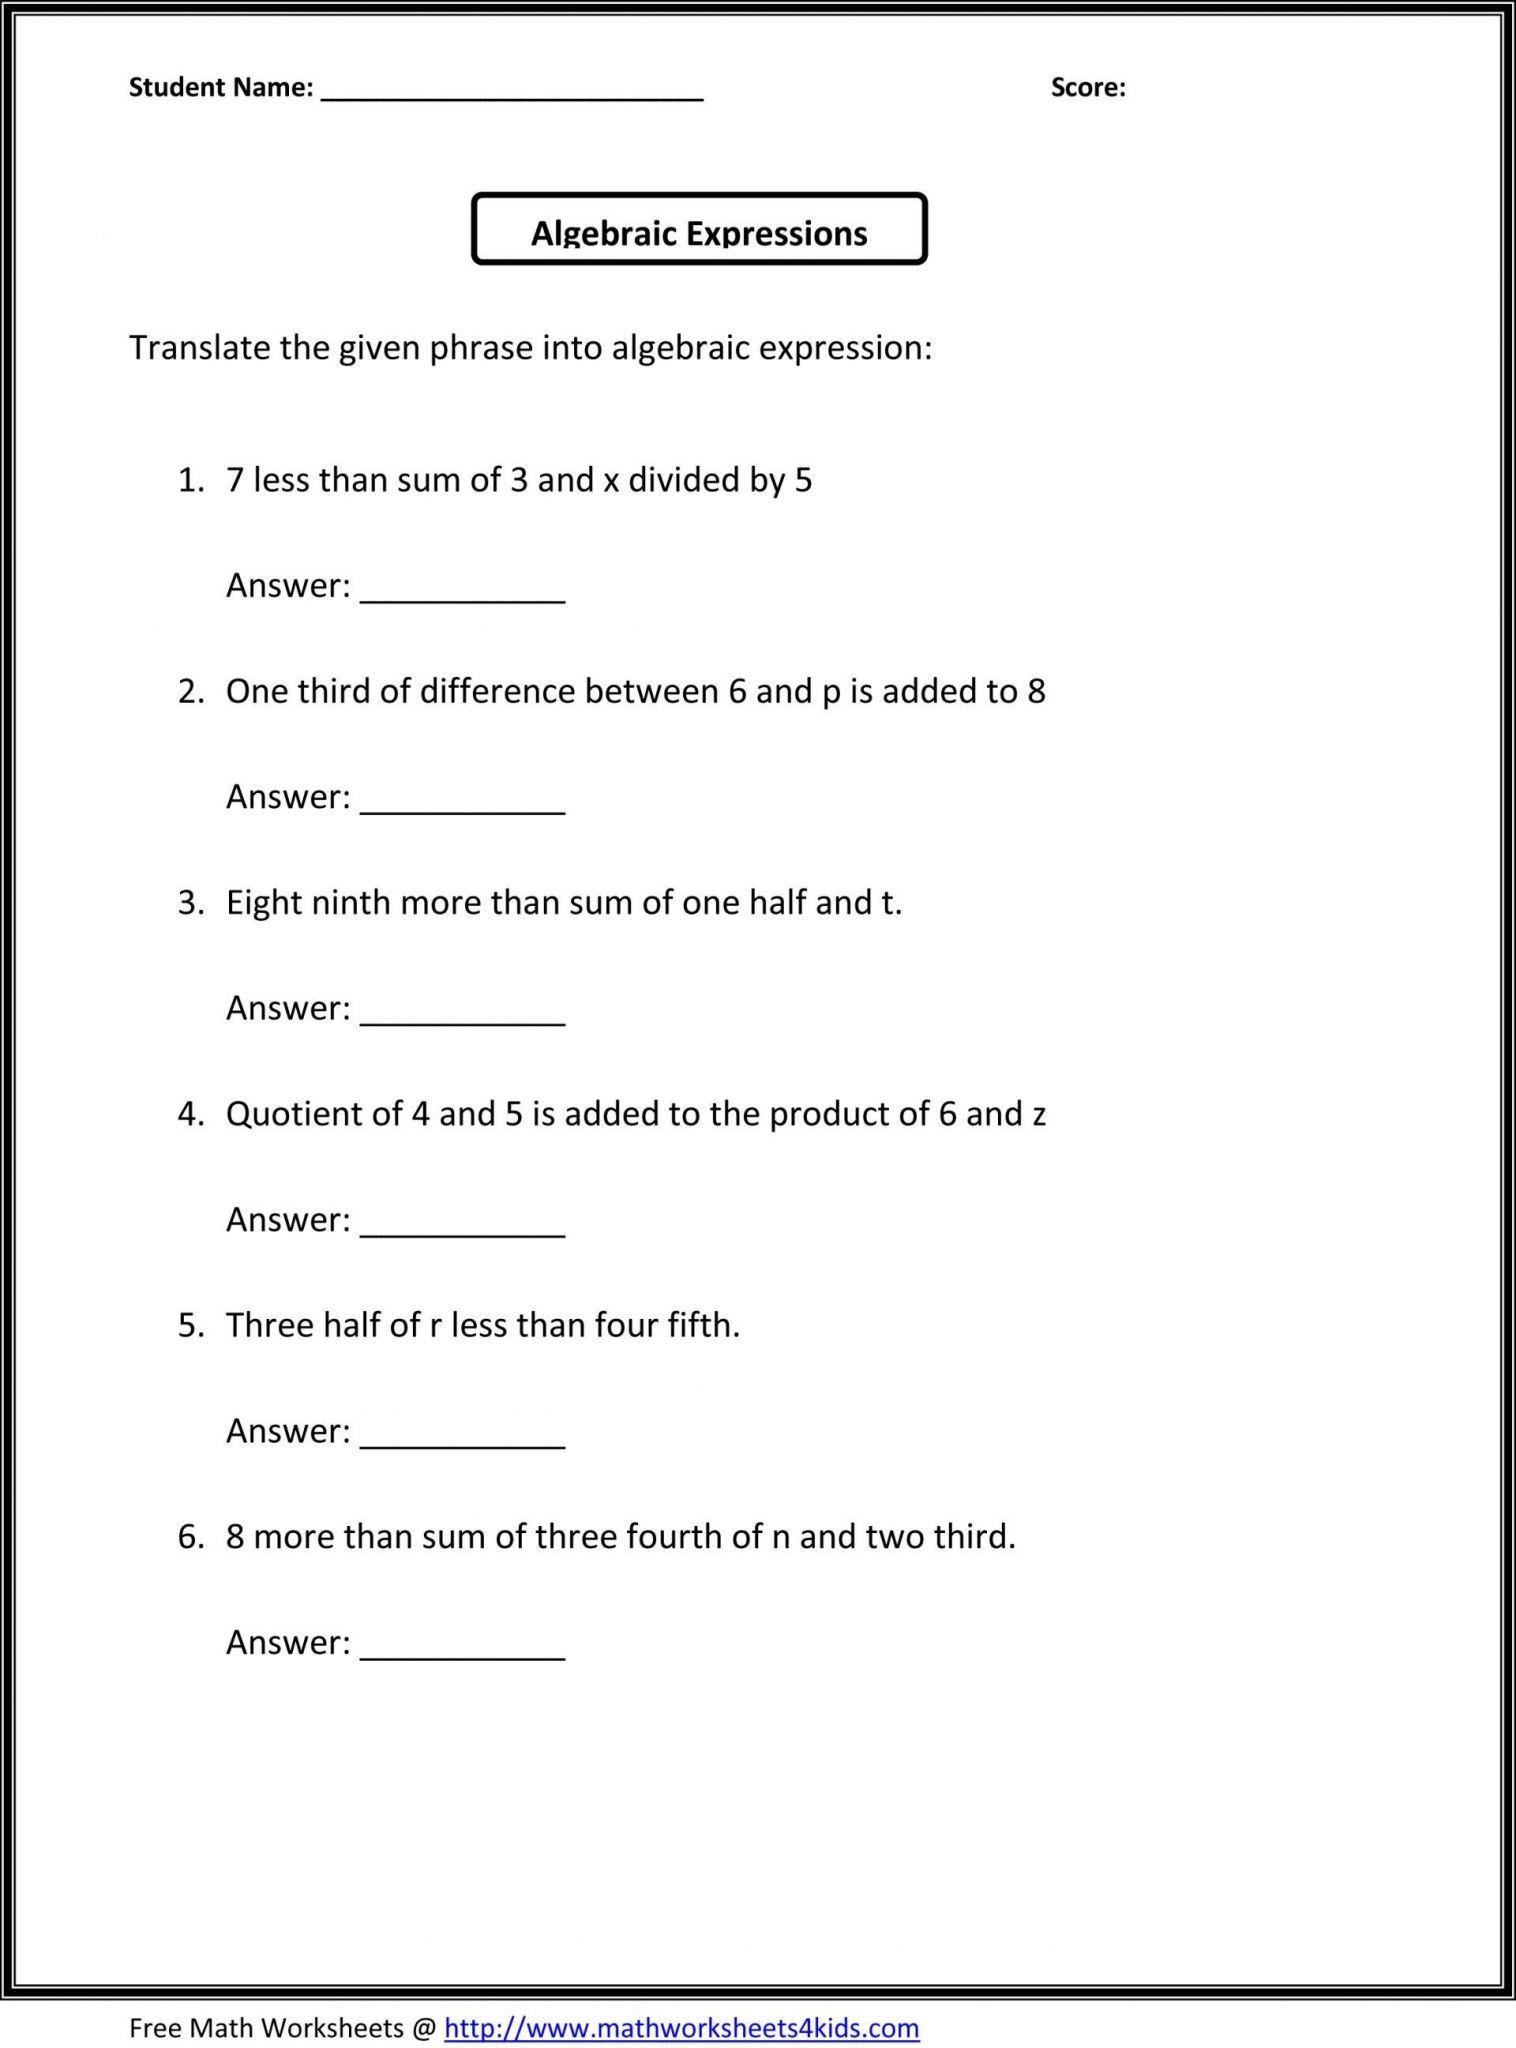 Evaluating Variable Expressions Worksheet